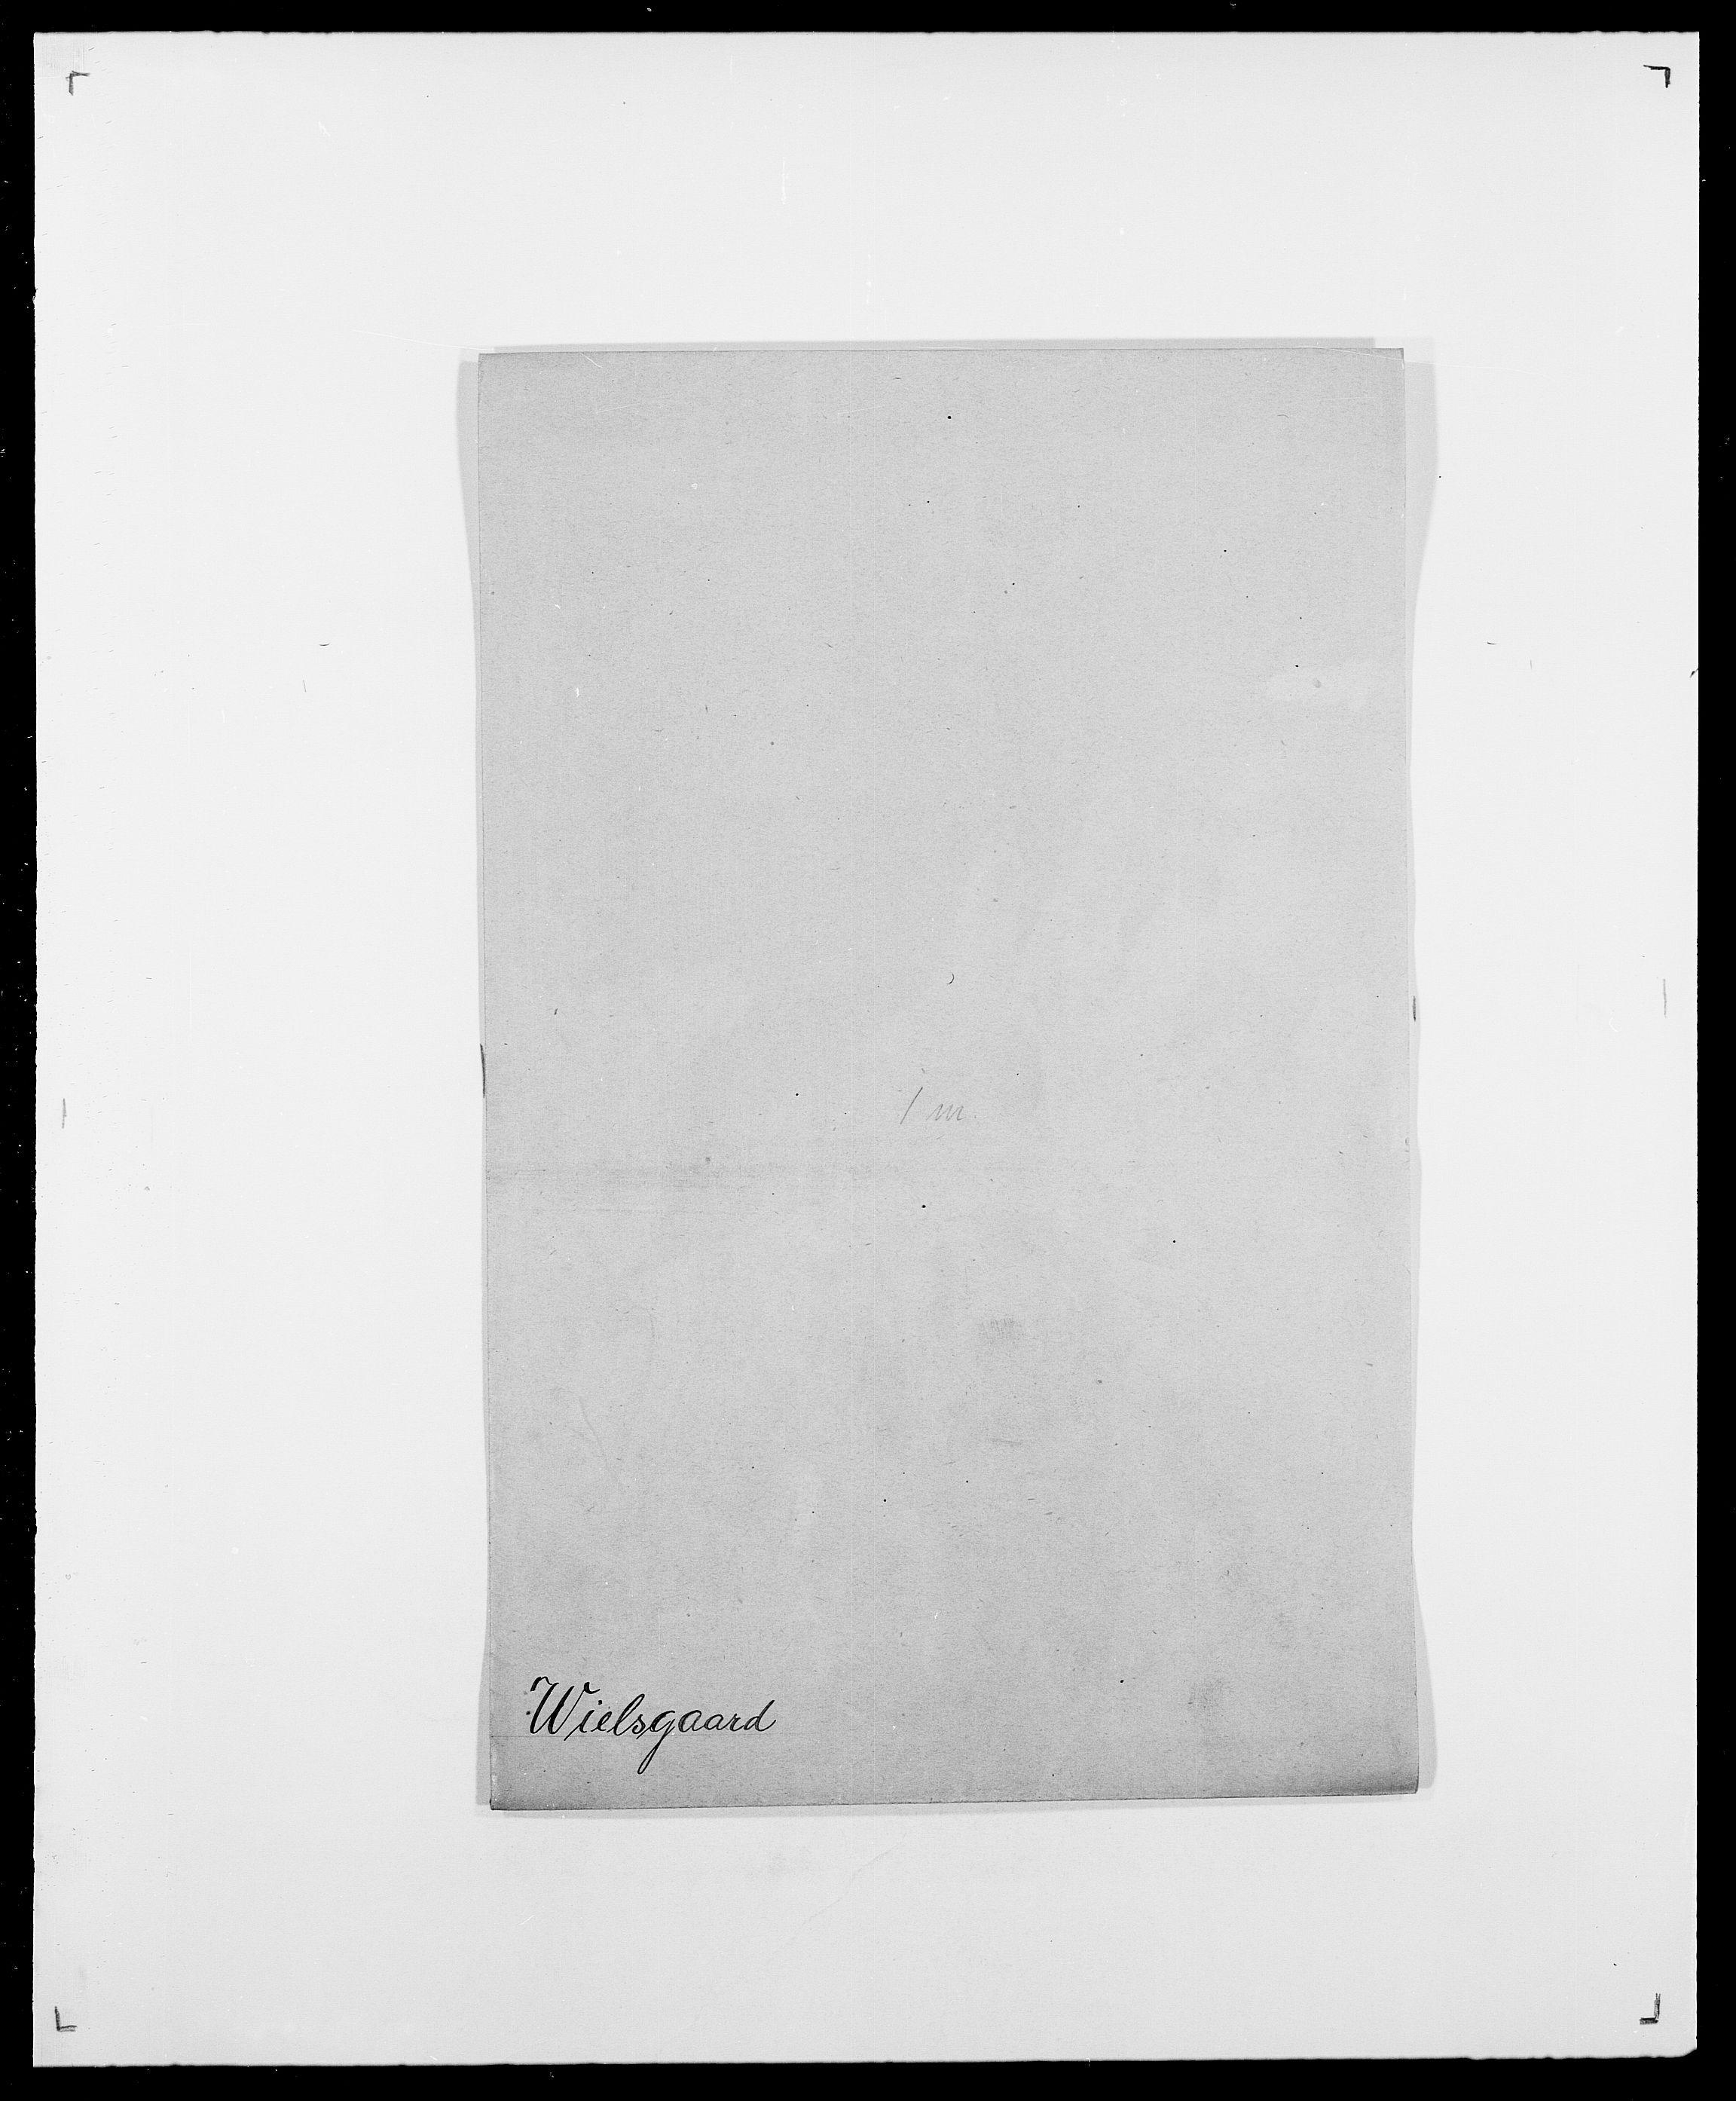 SAO, Delgobe, Charles Antoine - samling, D/Da/L0041: Vemmestad - Viker, s. 495